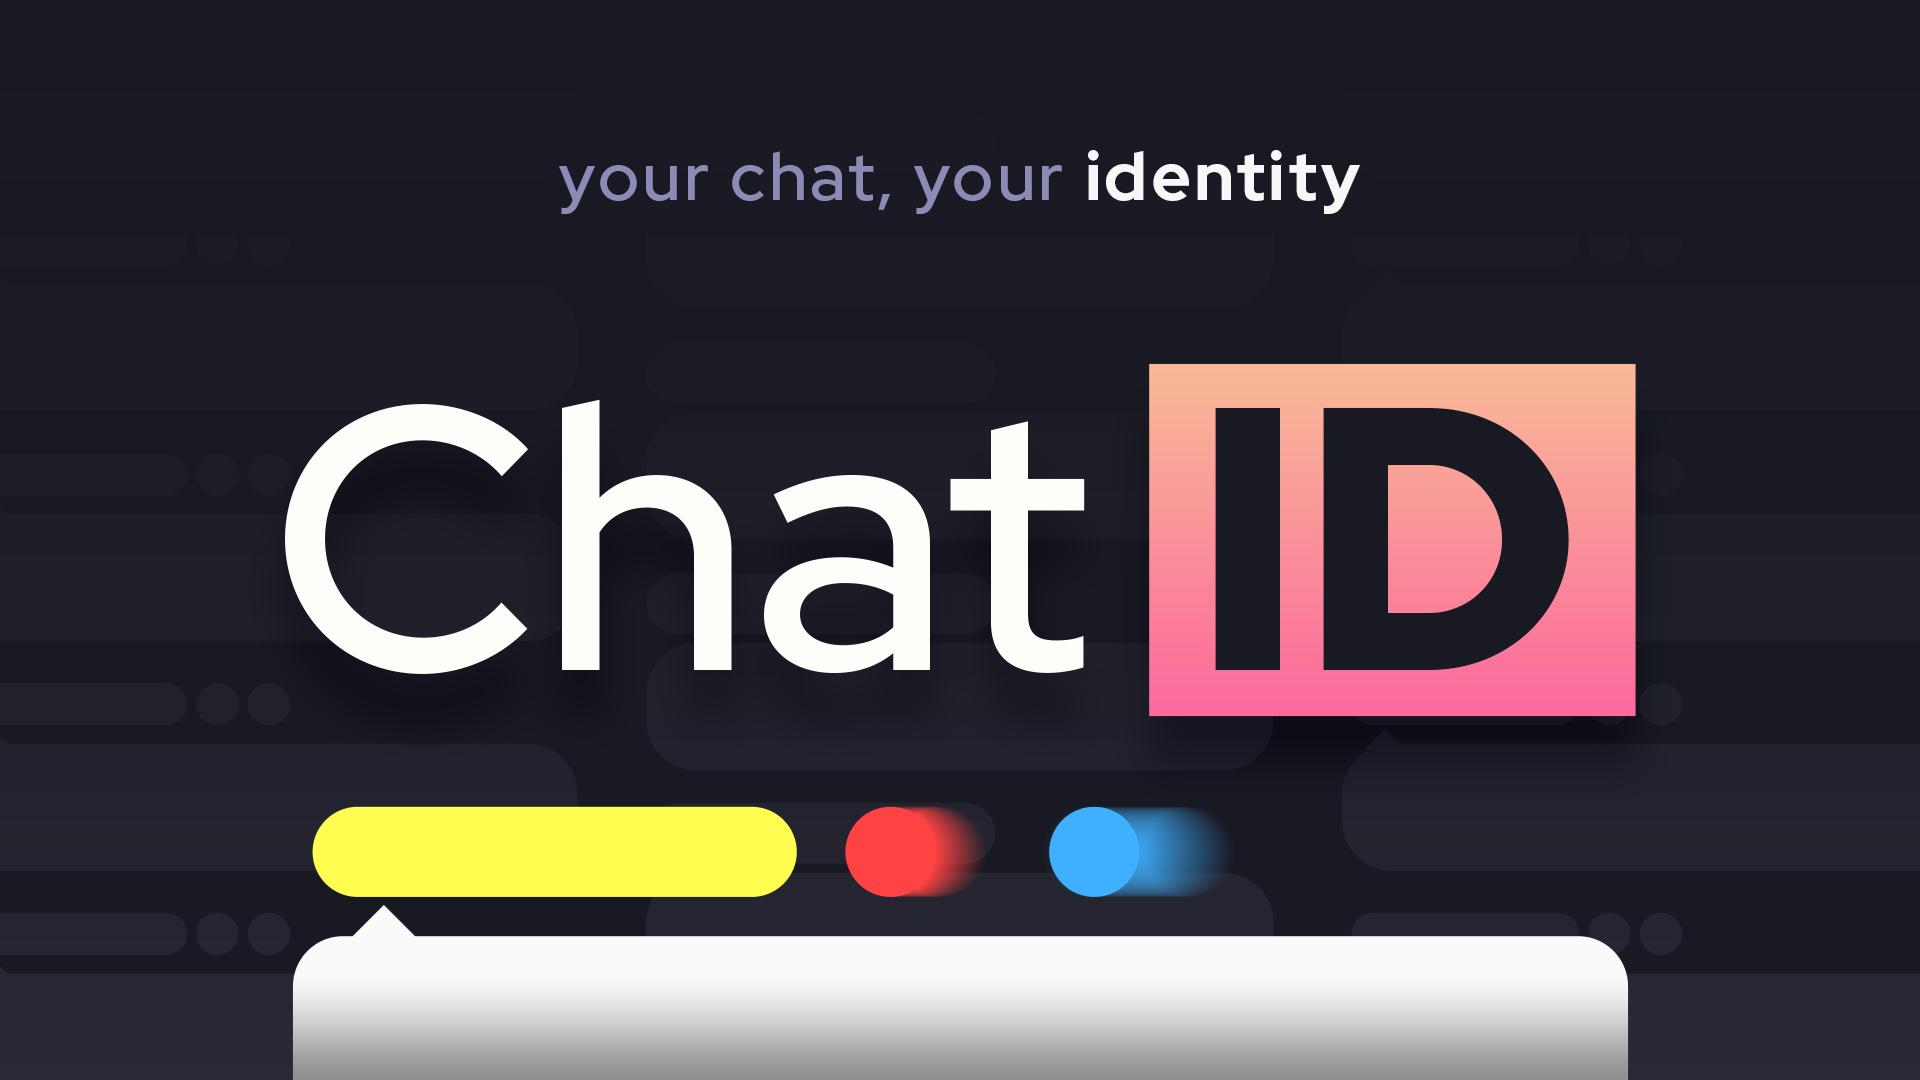 ChatID Chat Box Widget - Visuals by Impulse